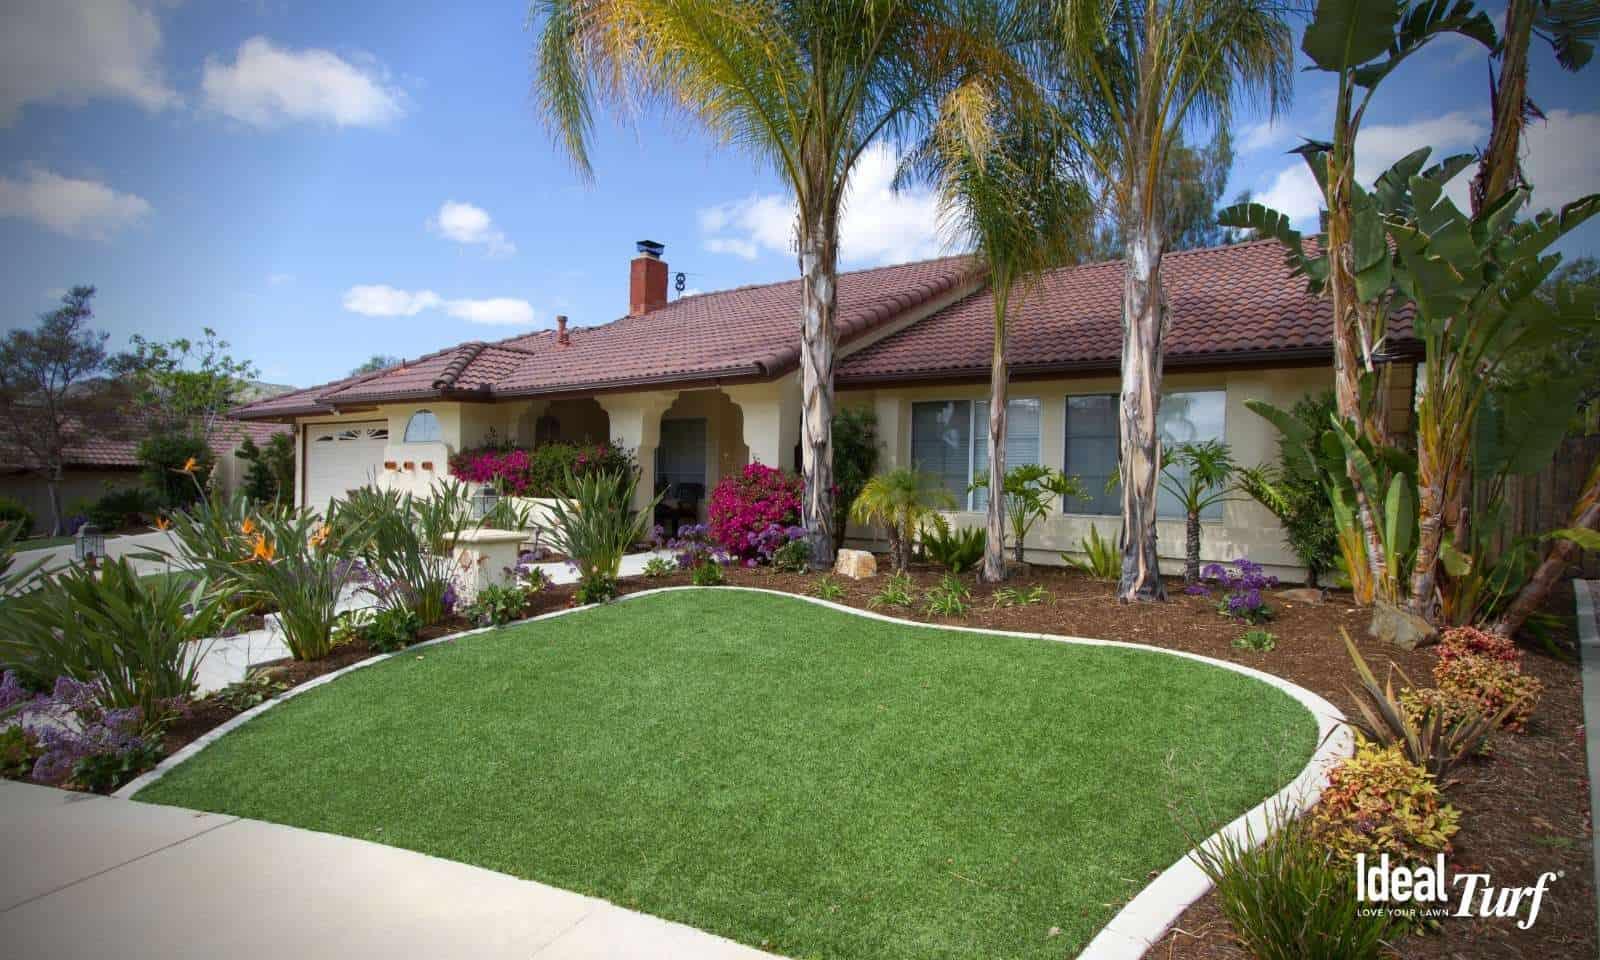 Artificial Grass Front Yard